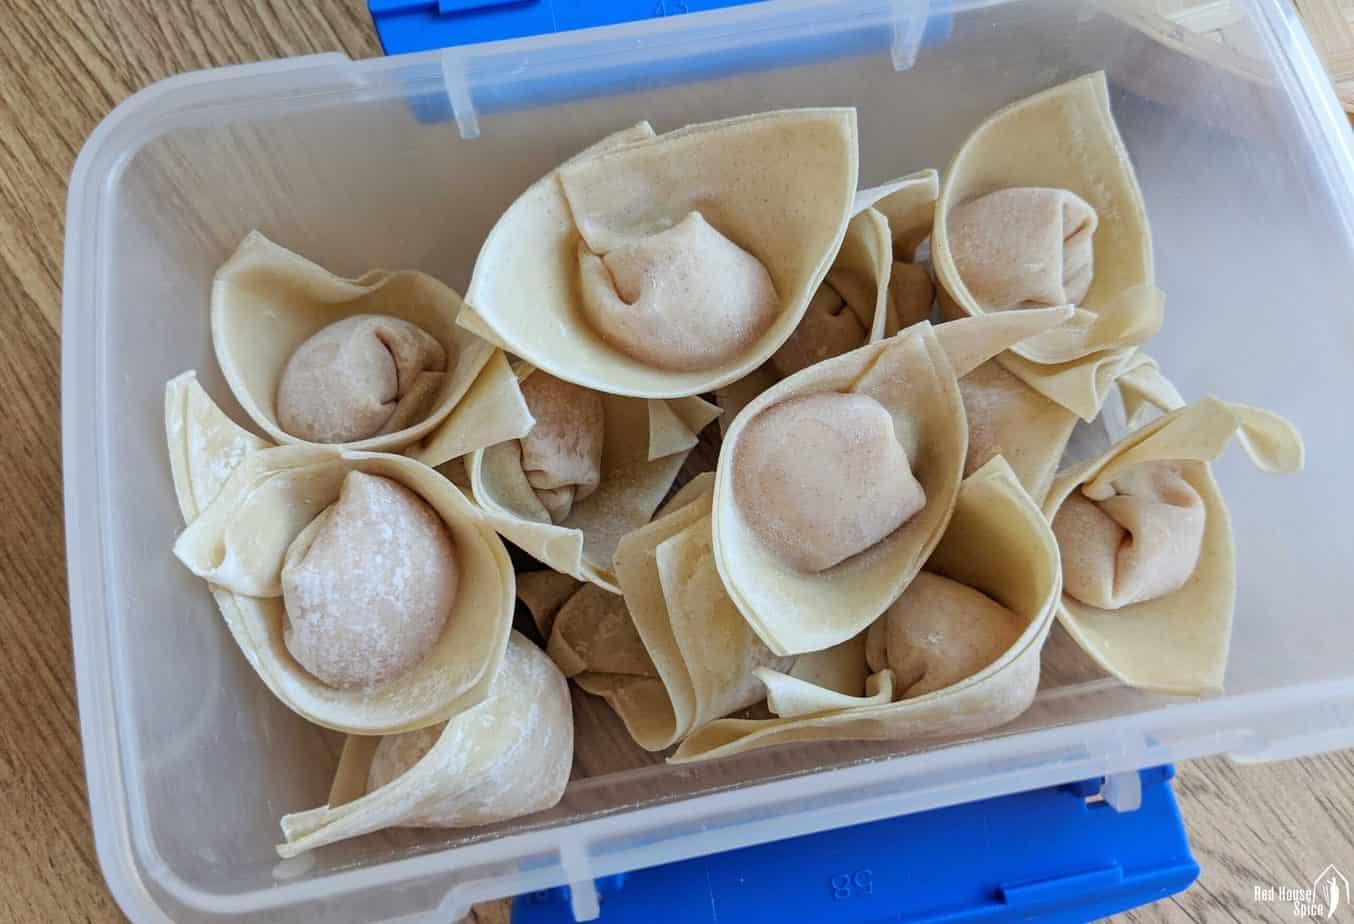 frozen wontons in a box